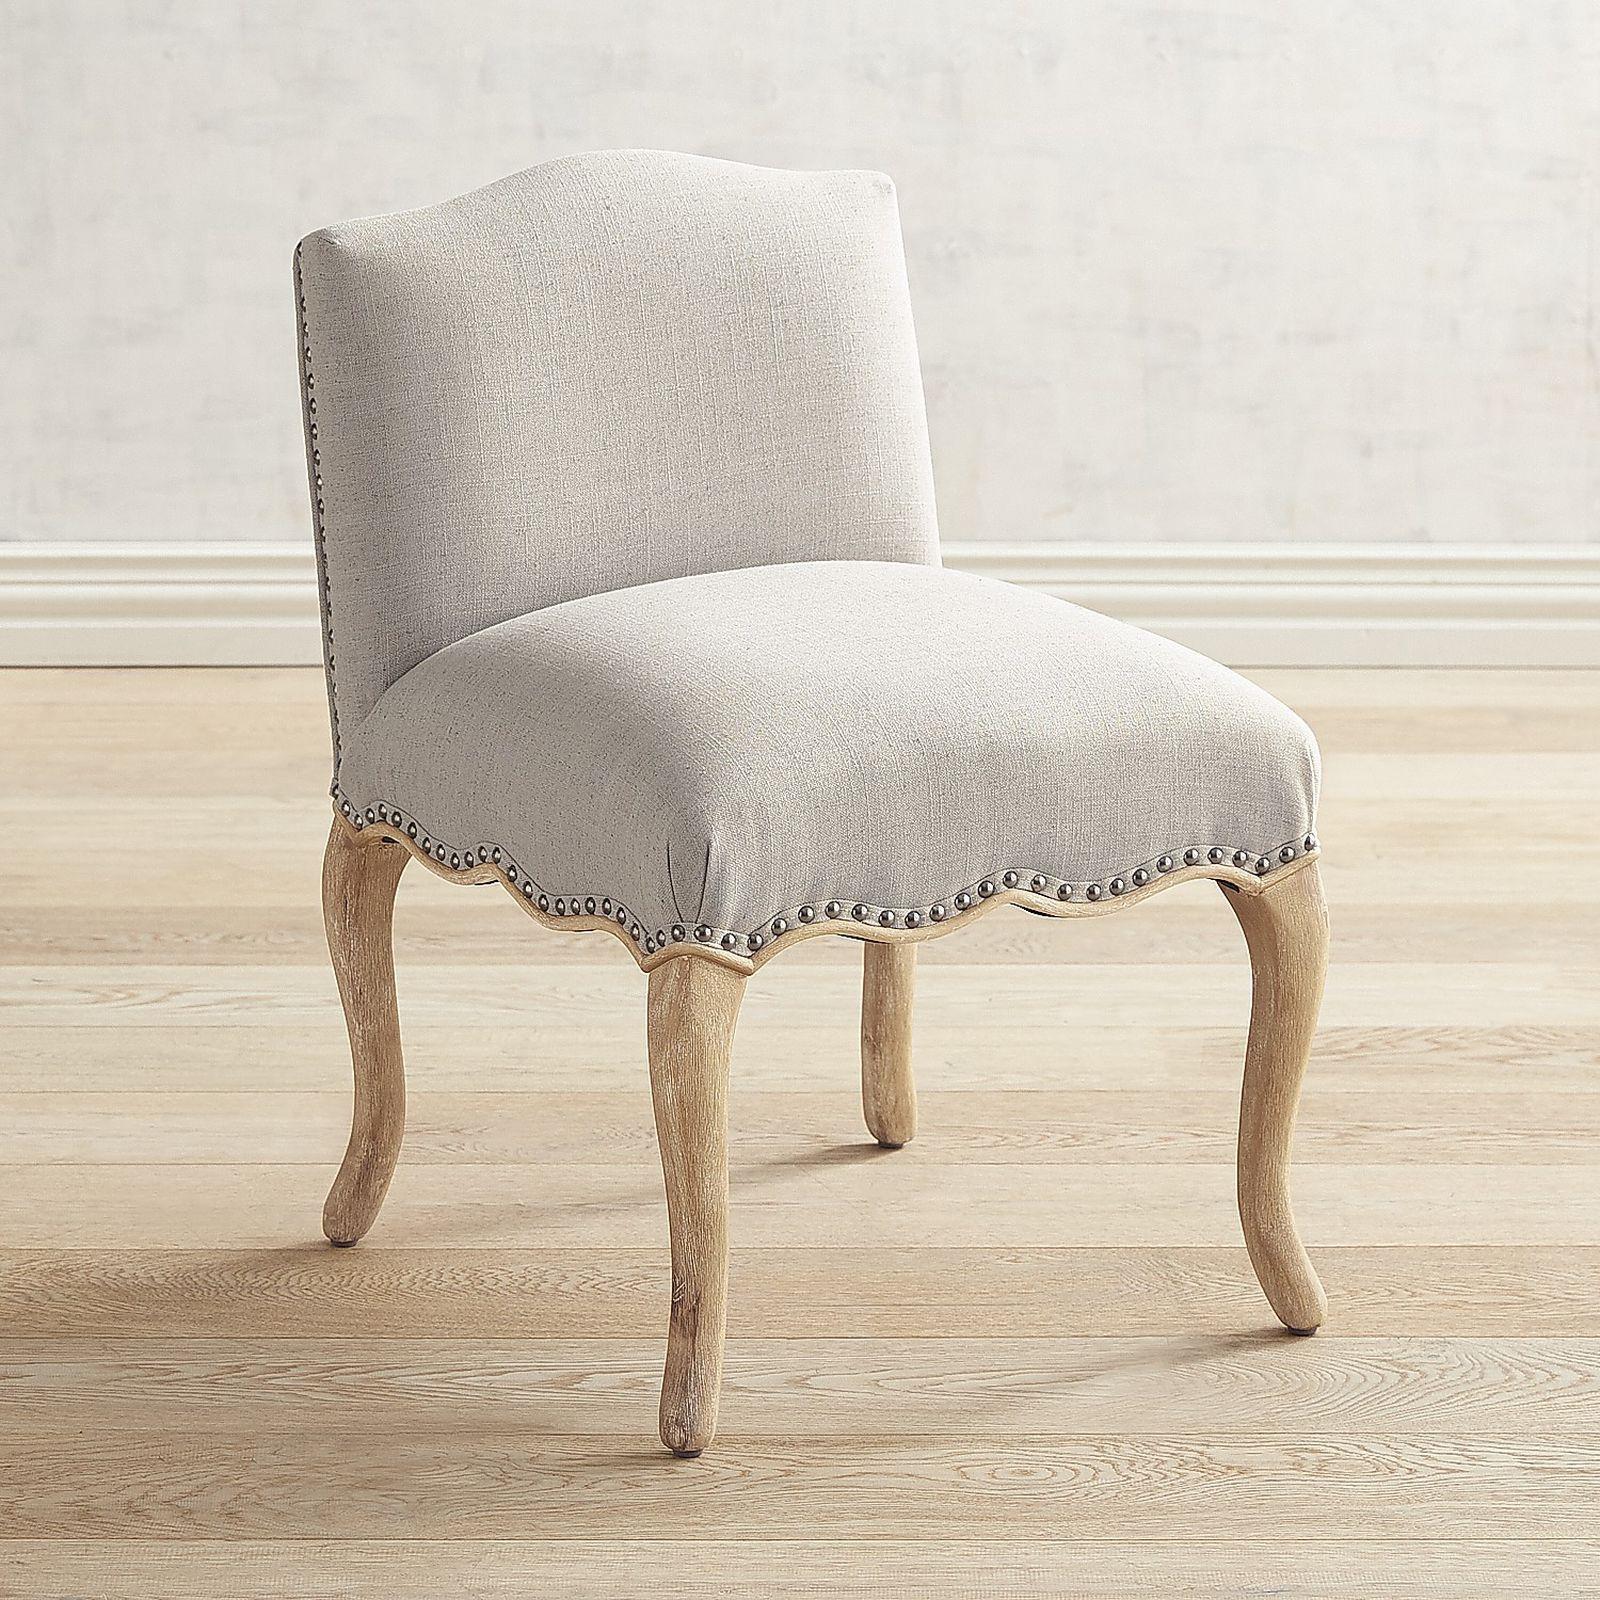 Claudine shadow gray vanity stool pier 1 imports